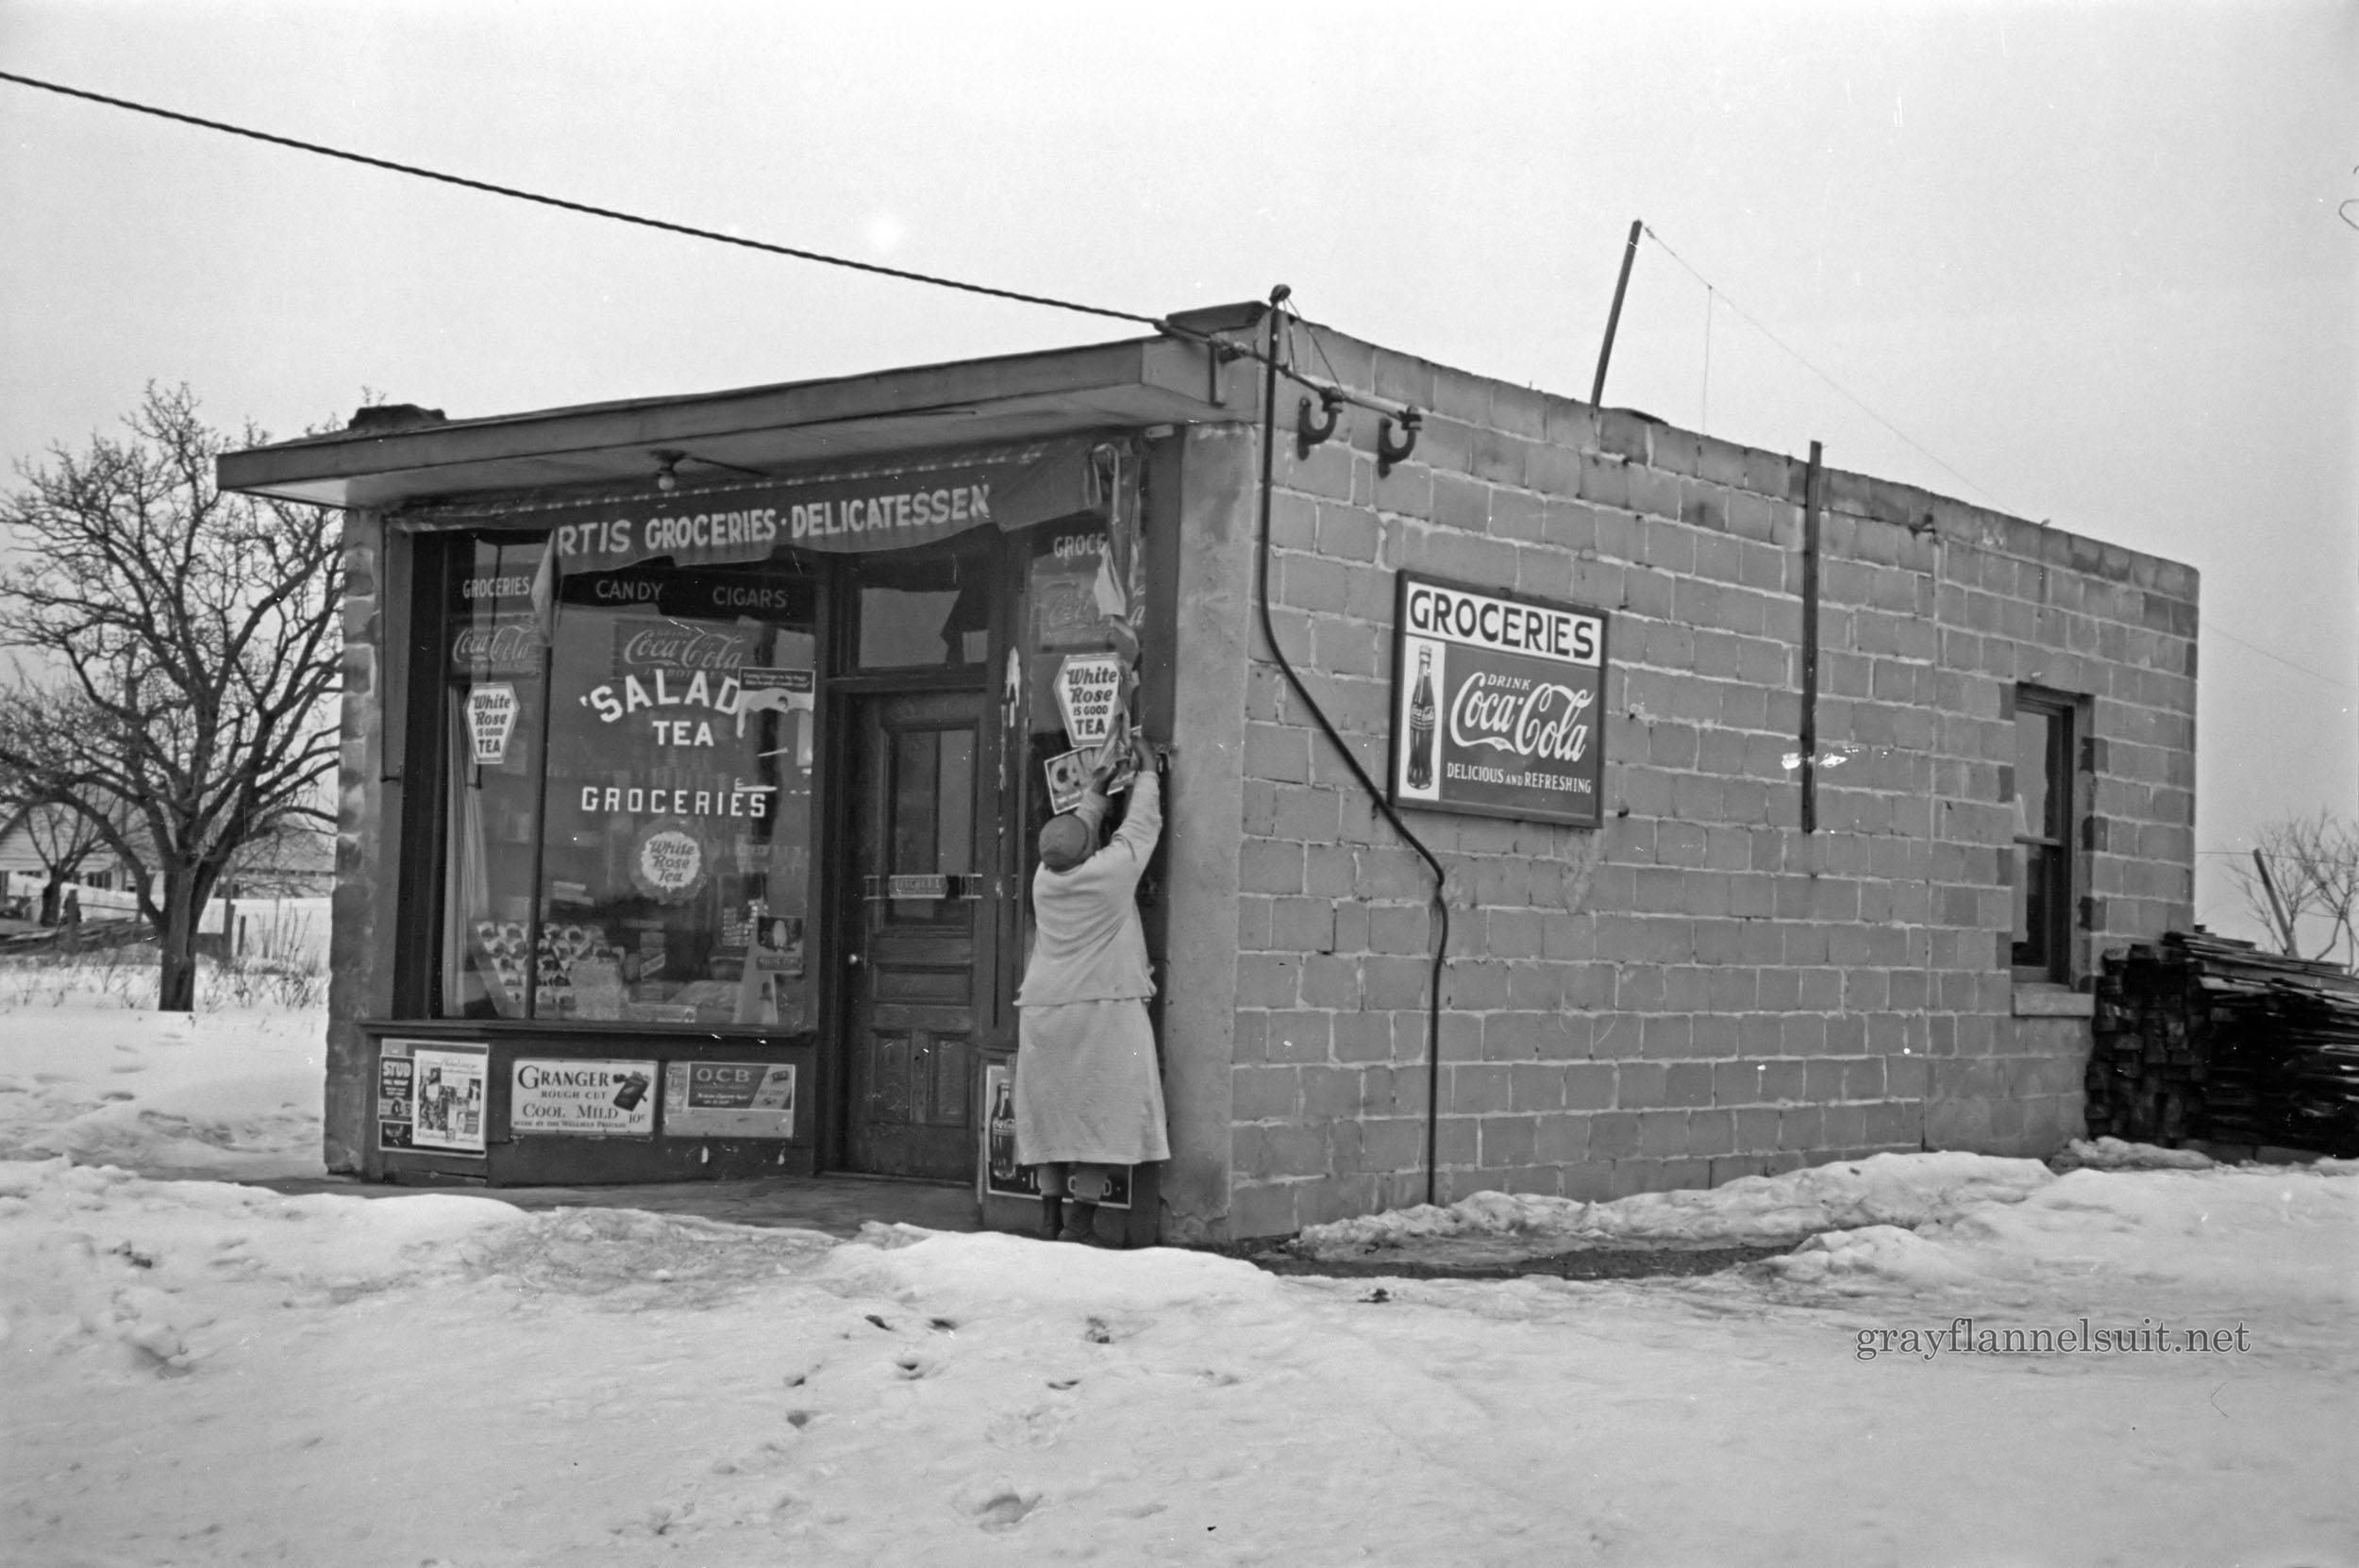 Vintage Photograph of a Franklin Township Deli, 1936